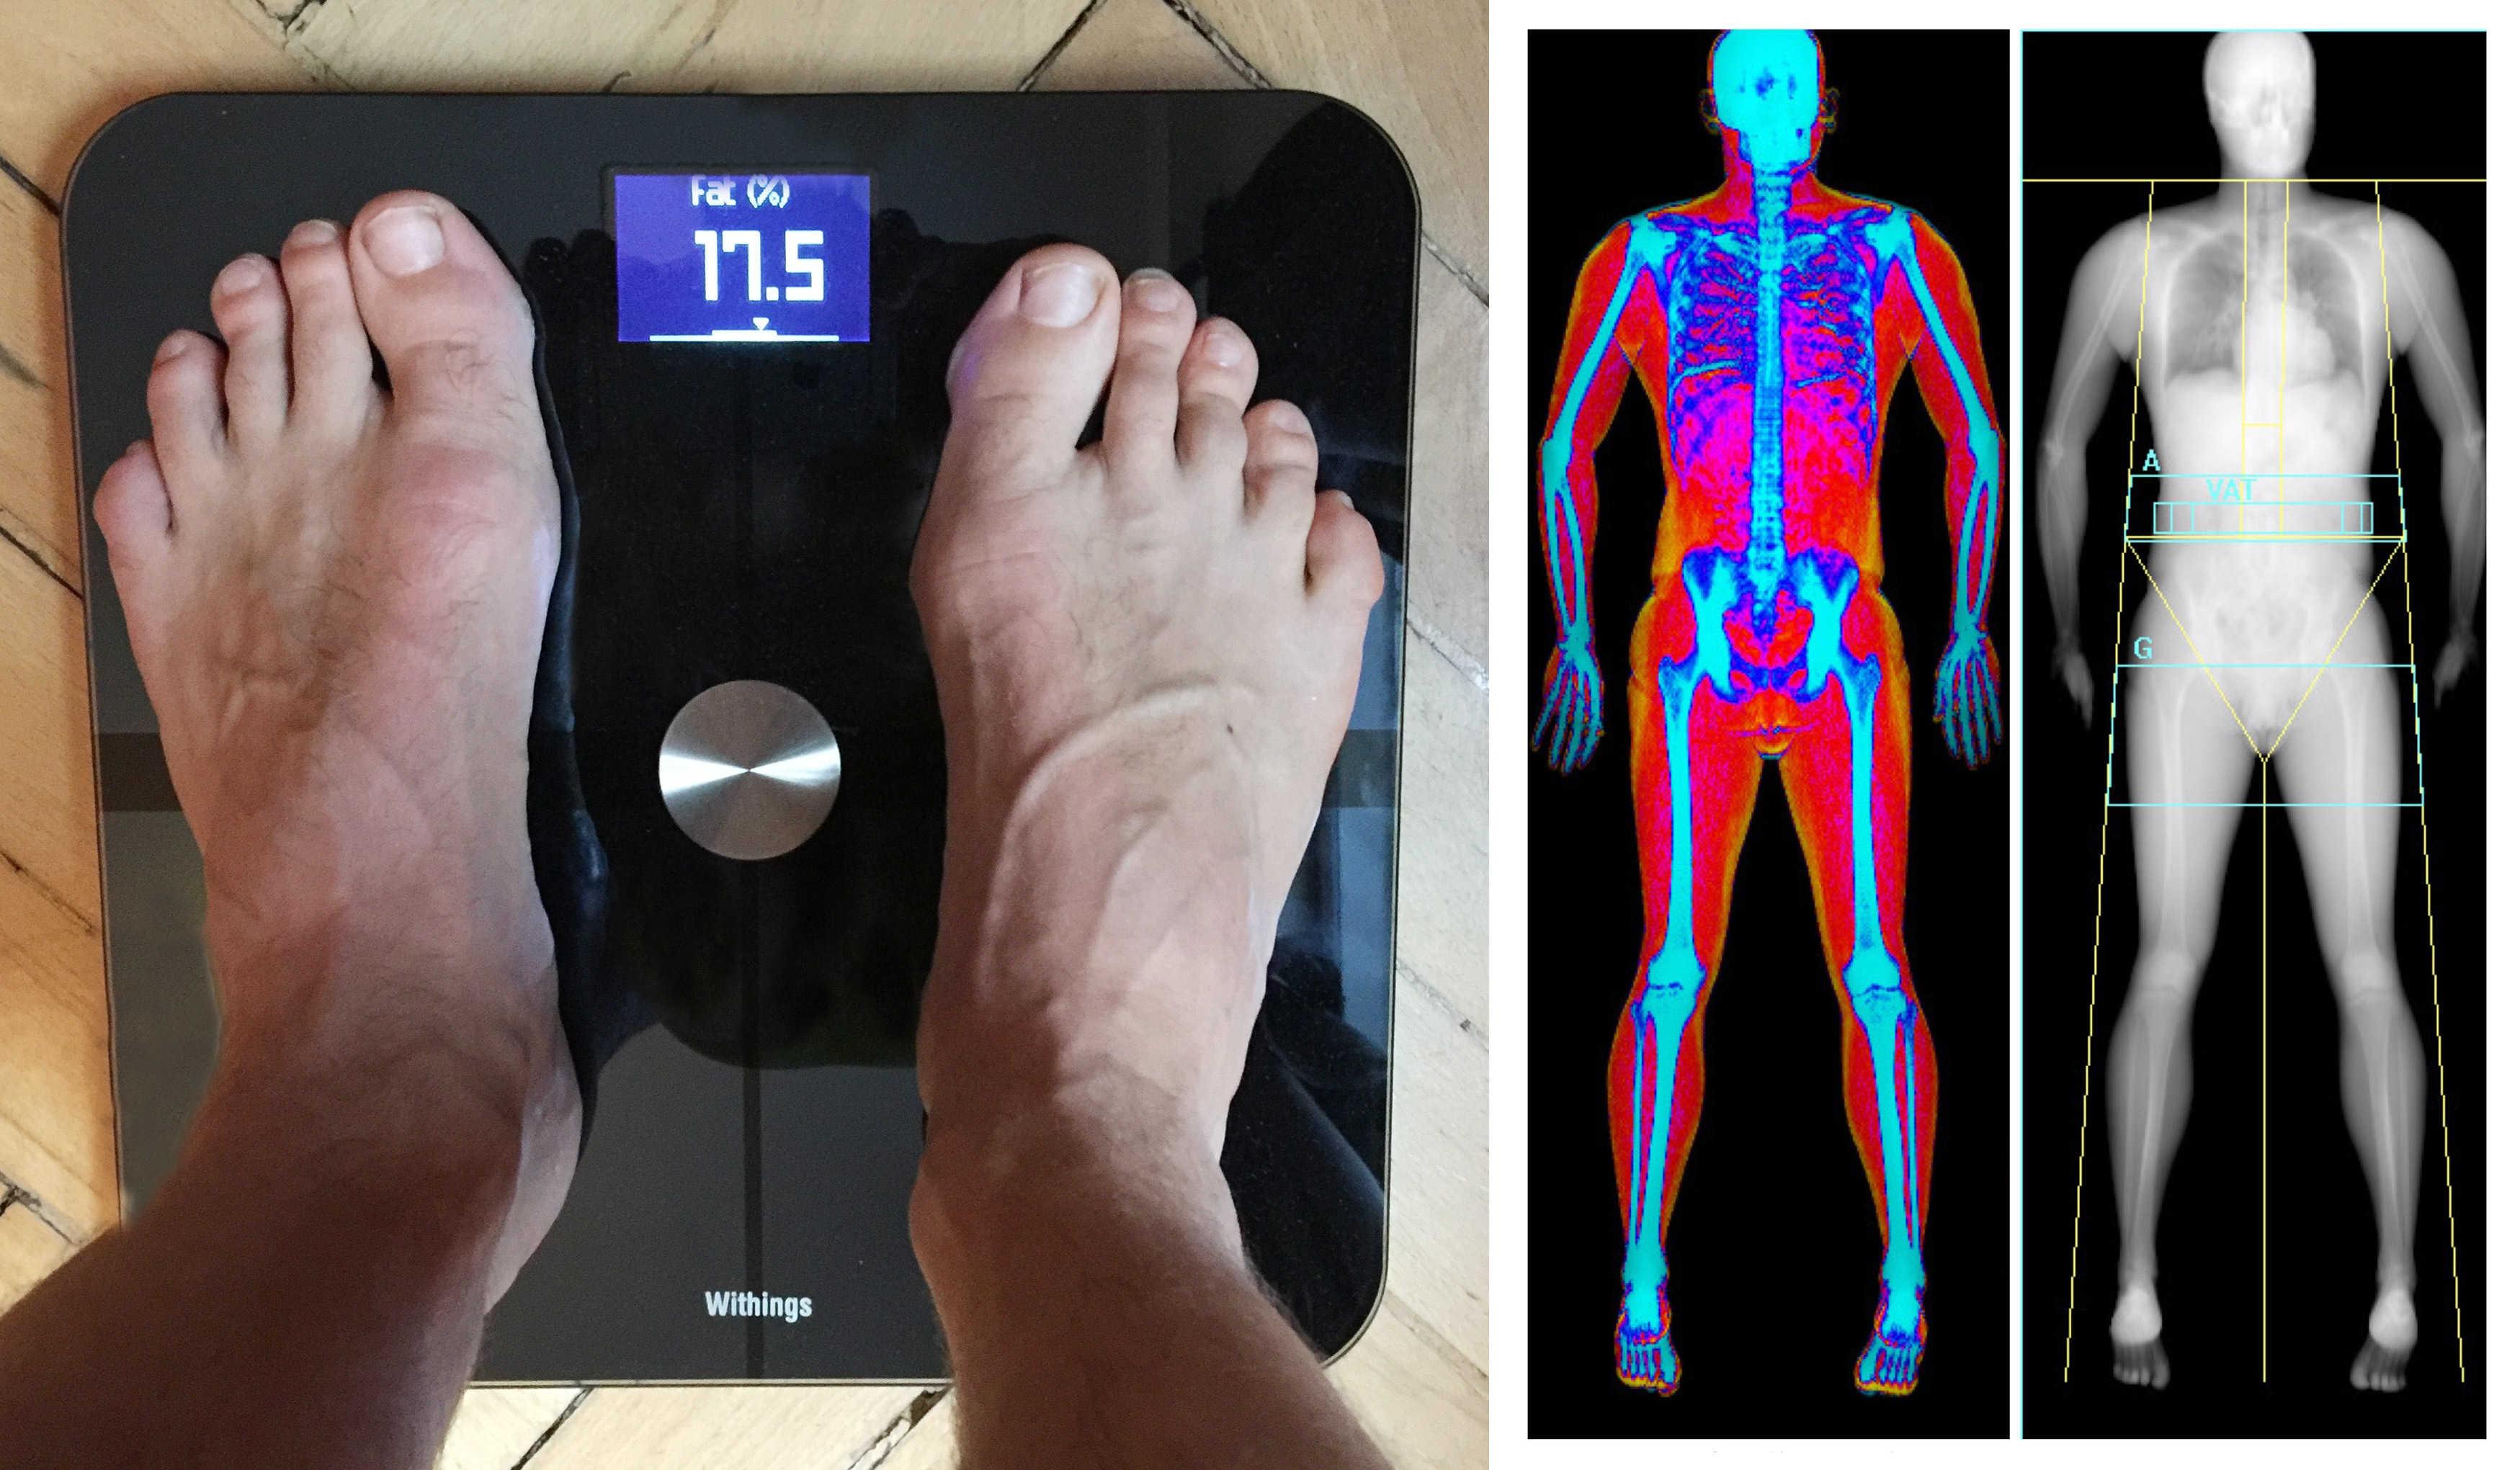 Withings Smart Body Analyzer (left) vs. DEXA, the